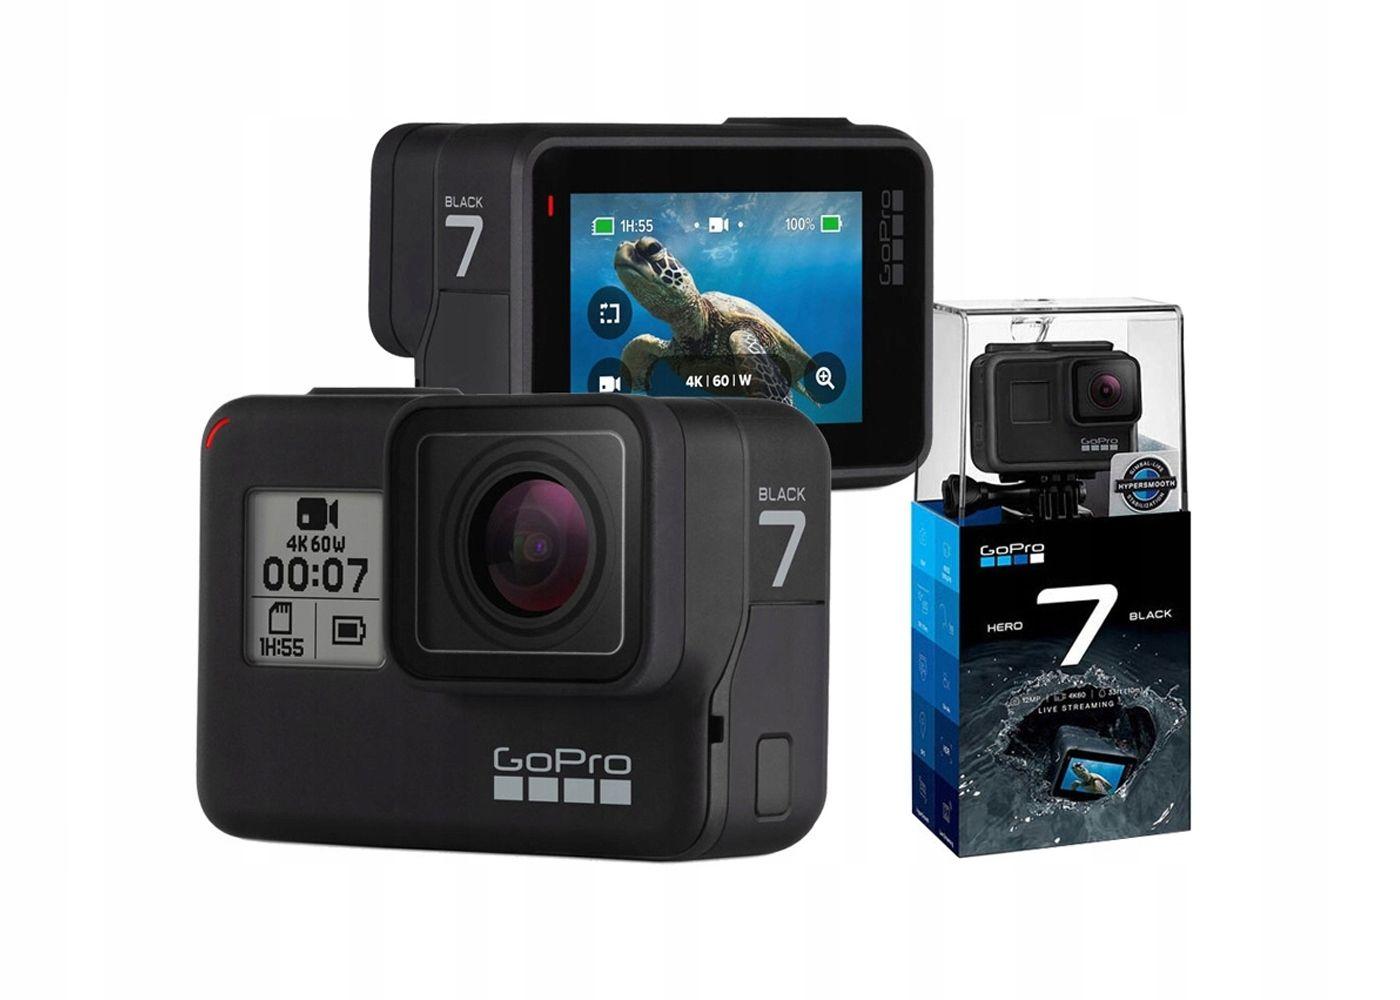 Kamera Sportowa Gopro Hero 7 Black 4k Wifi Go Pro 7575321565 Oficjalne Archiwum Allegro Gopro Gopro Hero Gopro Photography